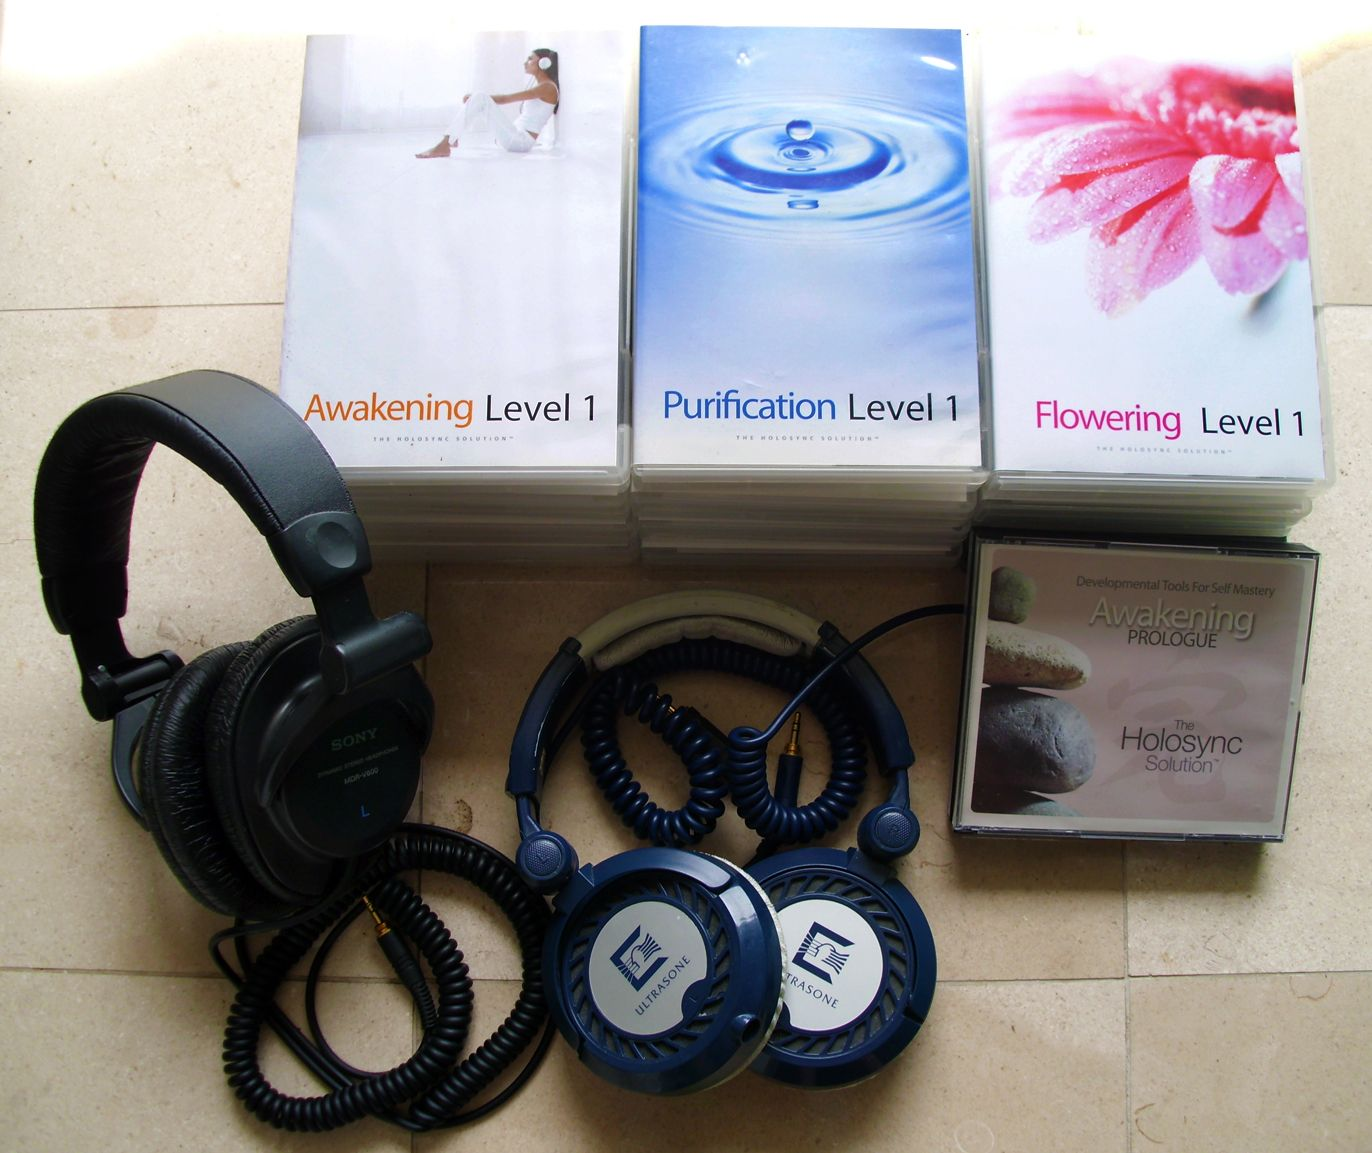 Centerpointe Research Holosync In Ear Headphones Over Ear Headphones Holo